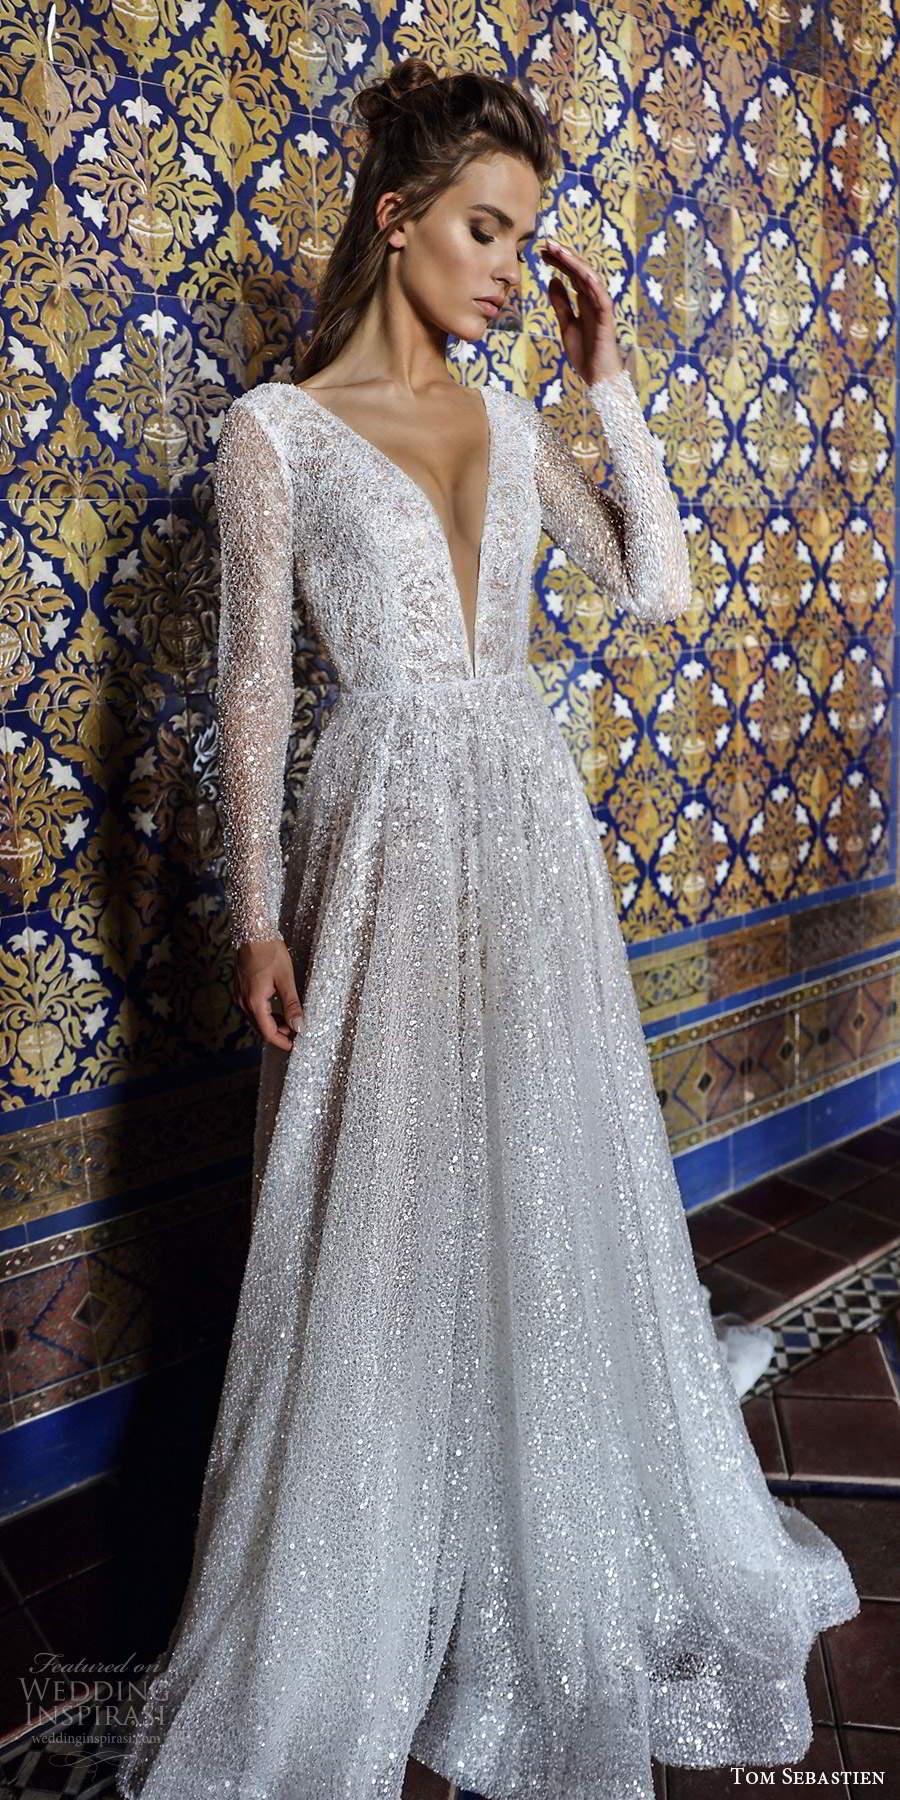 tom sebastien 2021 bridal long sleeve plunging v neckline fully embellished glitzy a line wedding dress chapel train (12) mv